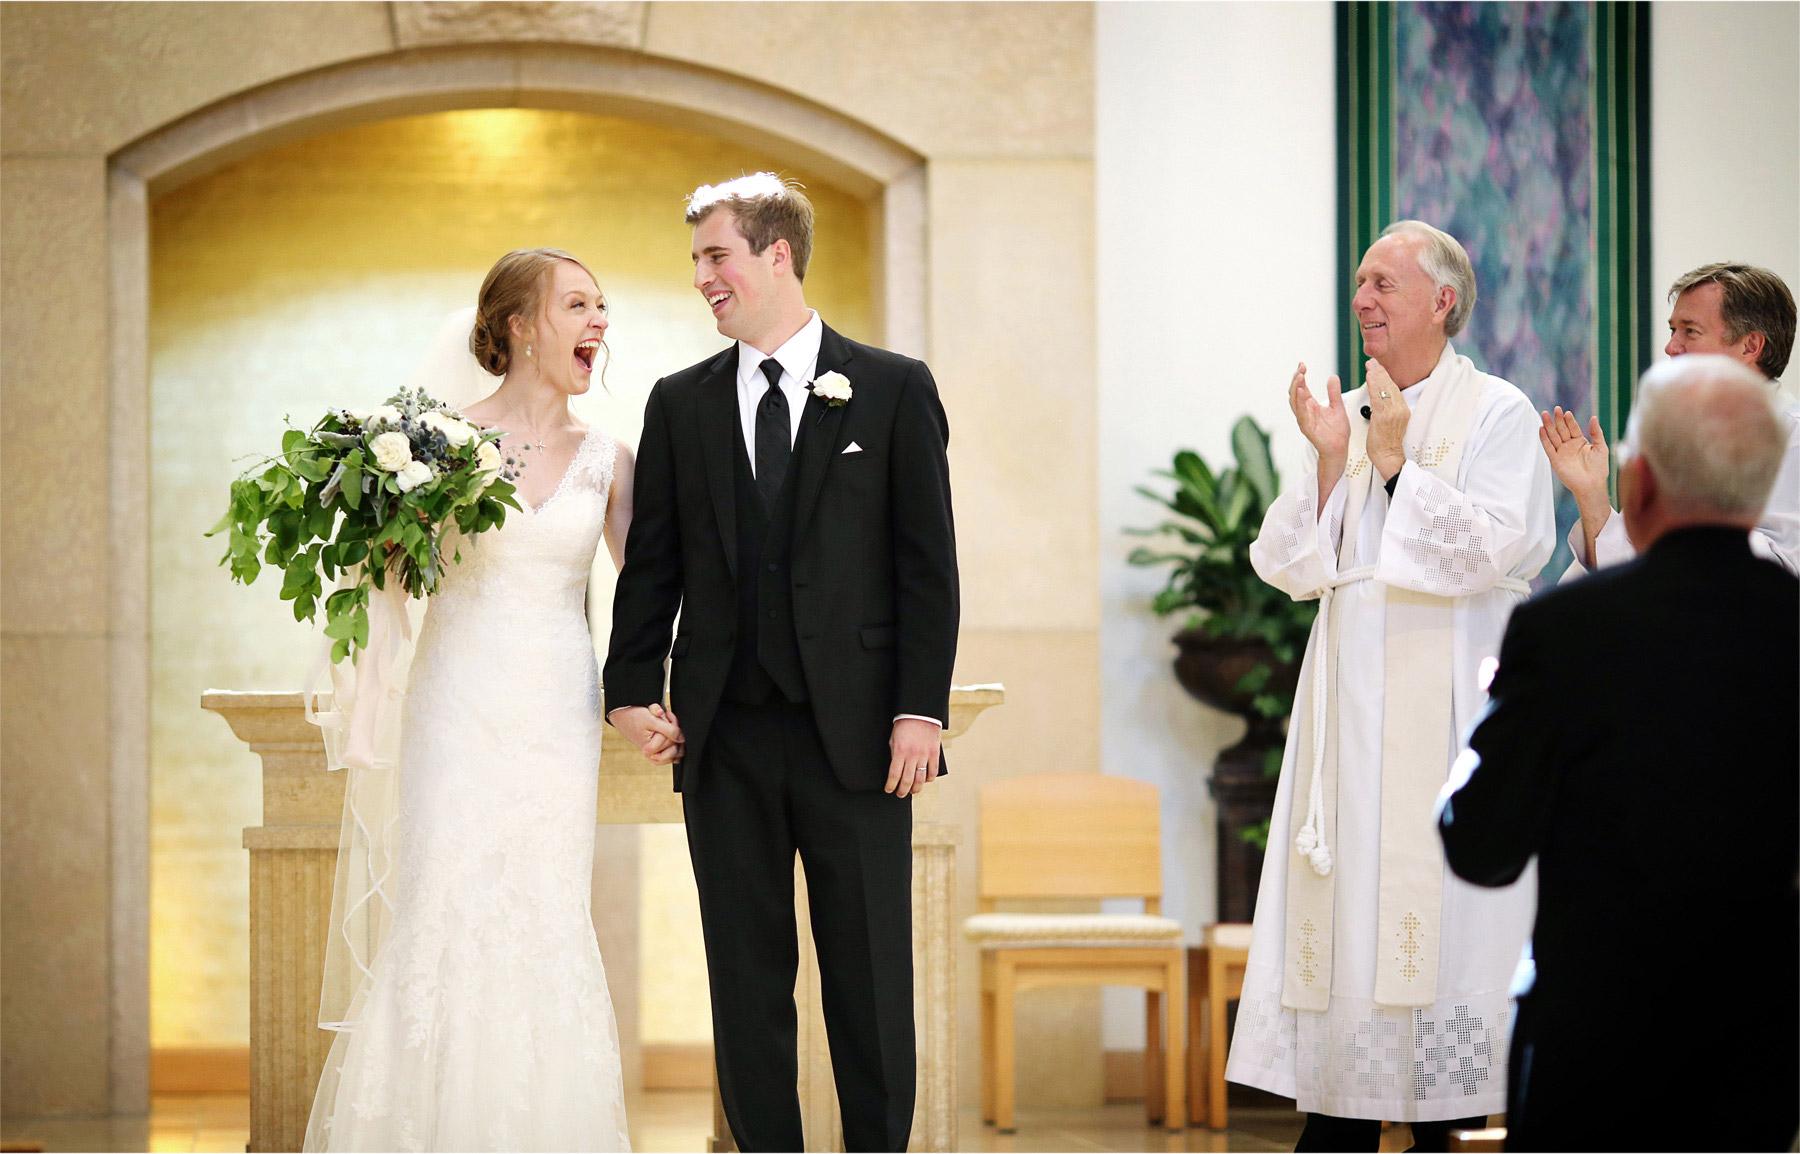 17-Edina-Minnesota-Wedding-Photographer-by-Andrew-Vick-Photography-Summer-Our-Lady-of-Grace-Catholic-Parish-Church-Ceremony-Bride-Groom-Excitement-Betsy-and-Jon.jpg